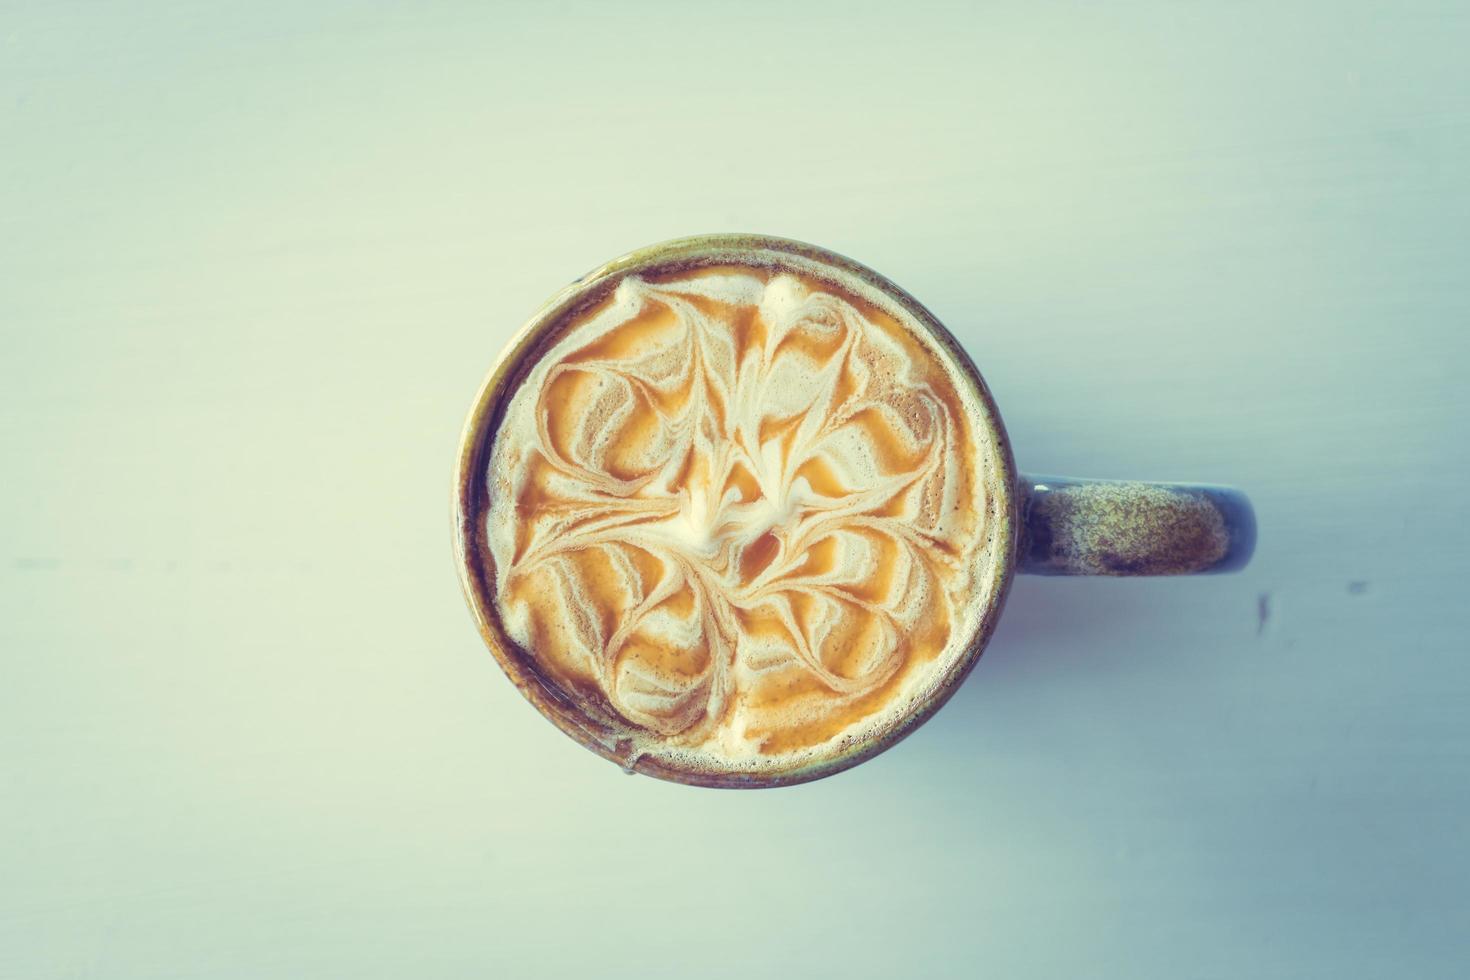 Hot latte caramel macchiato cup photo